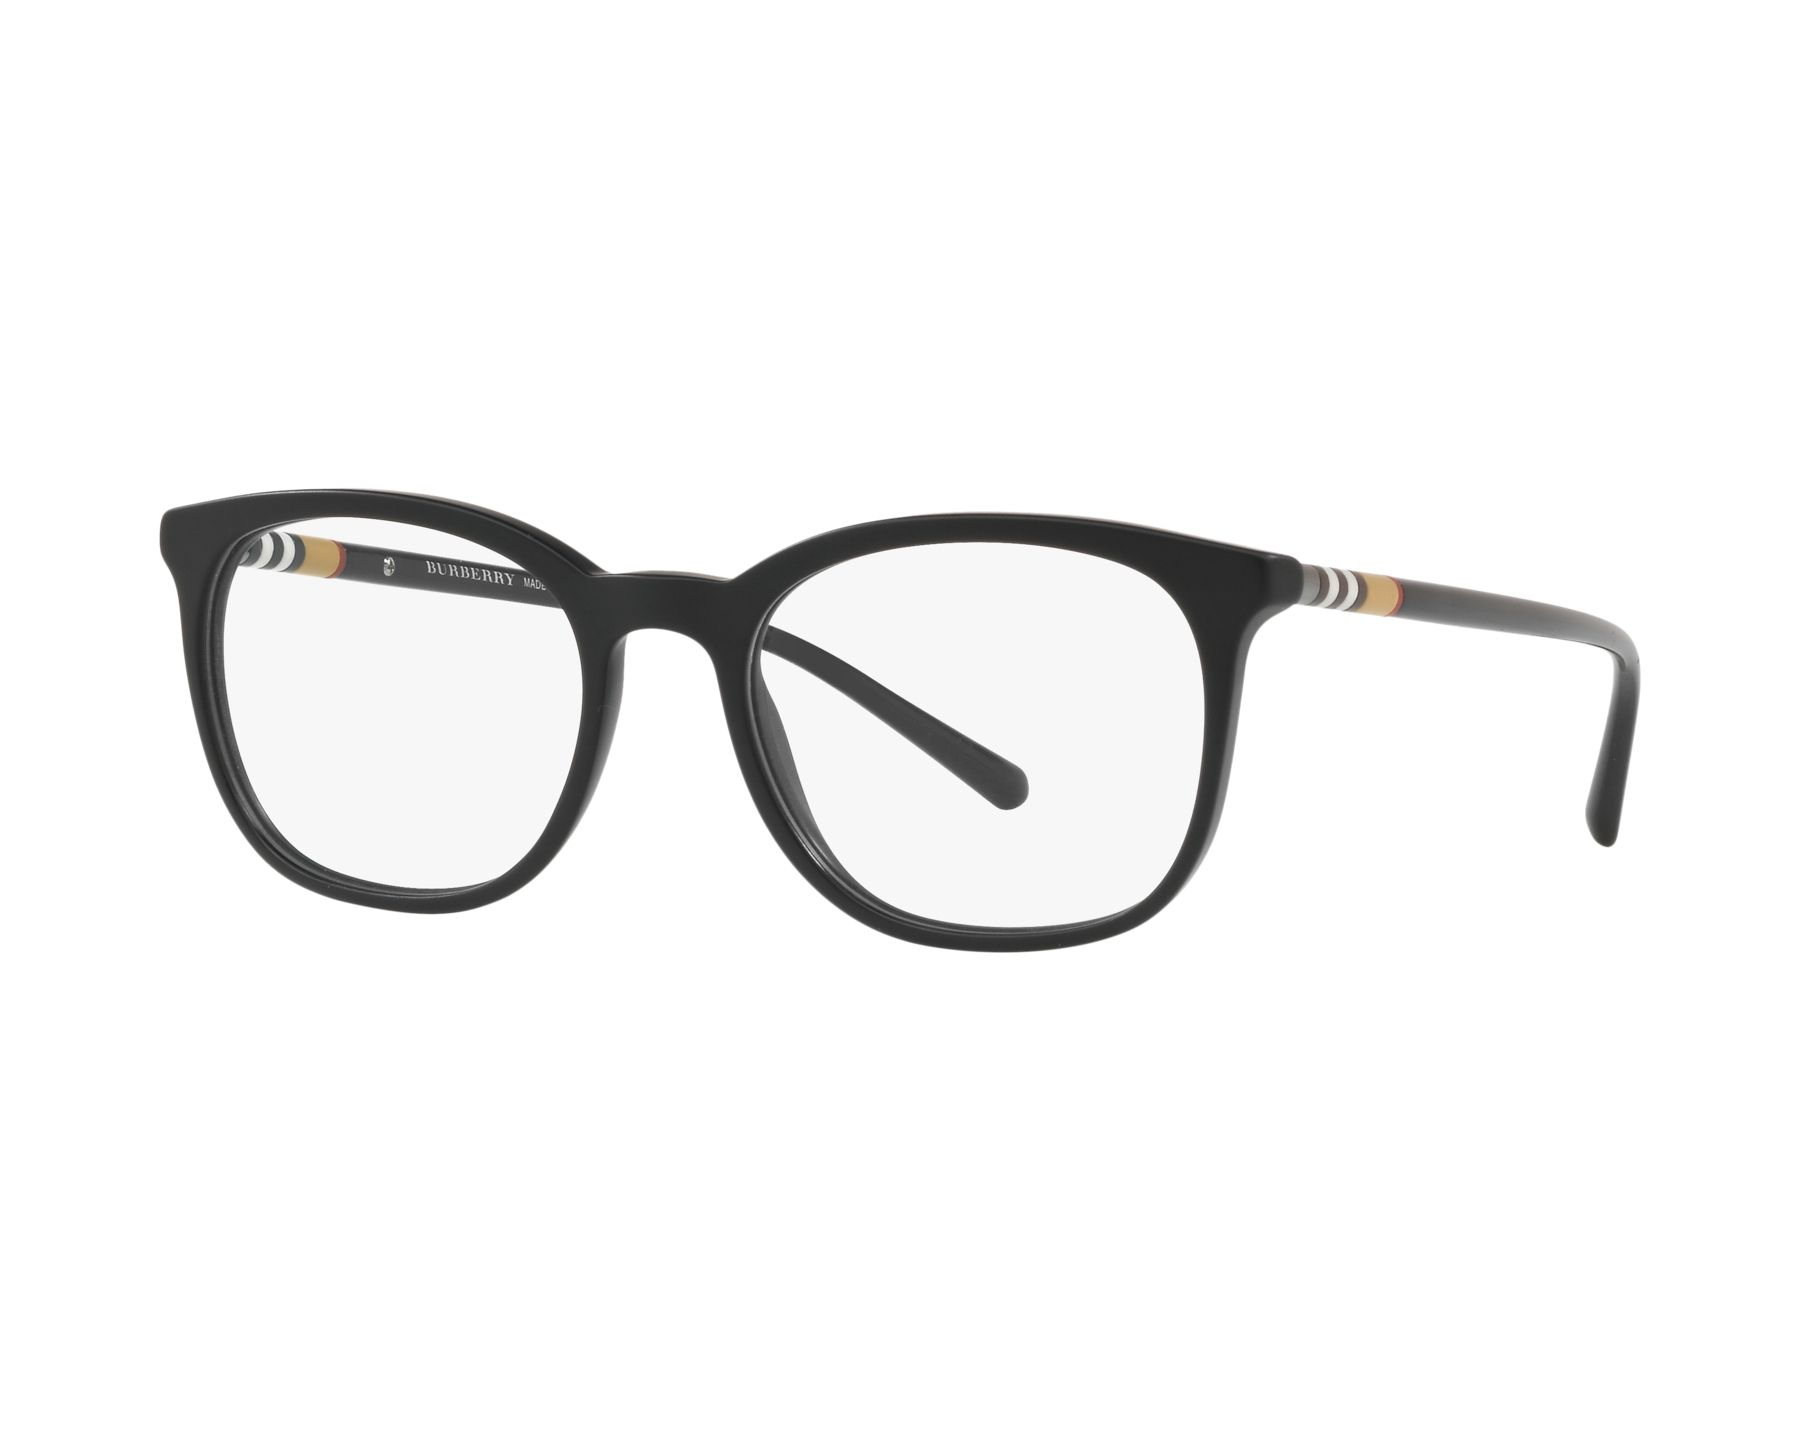 eyeglasses Burberry BE-2266 3464 54-19 Black Black 360 degree view 1